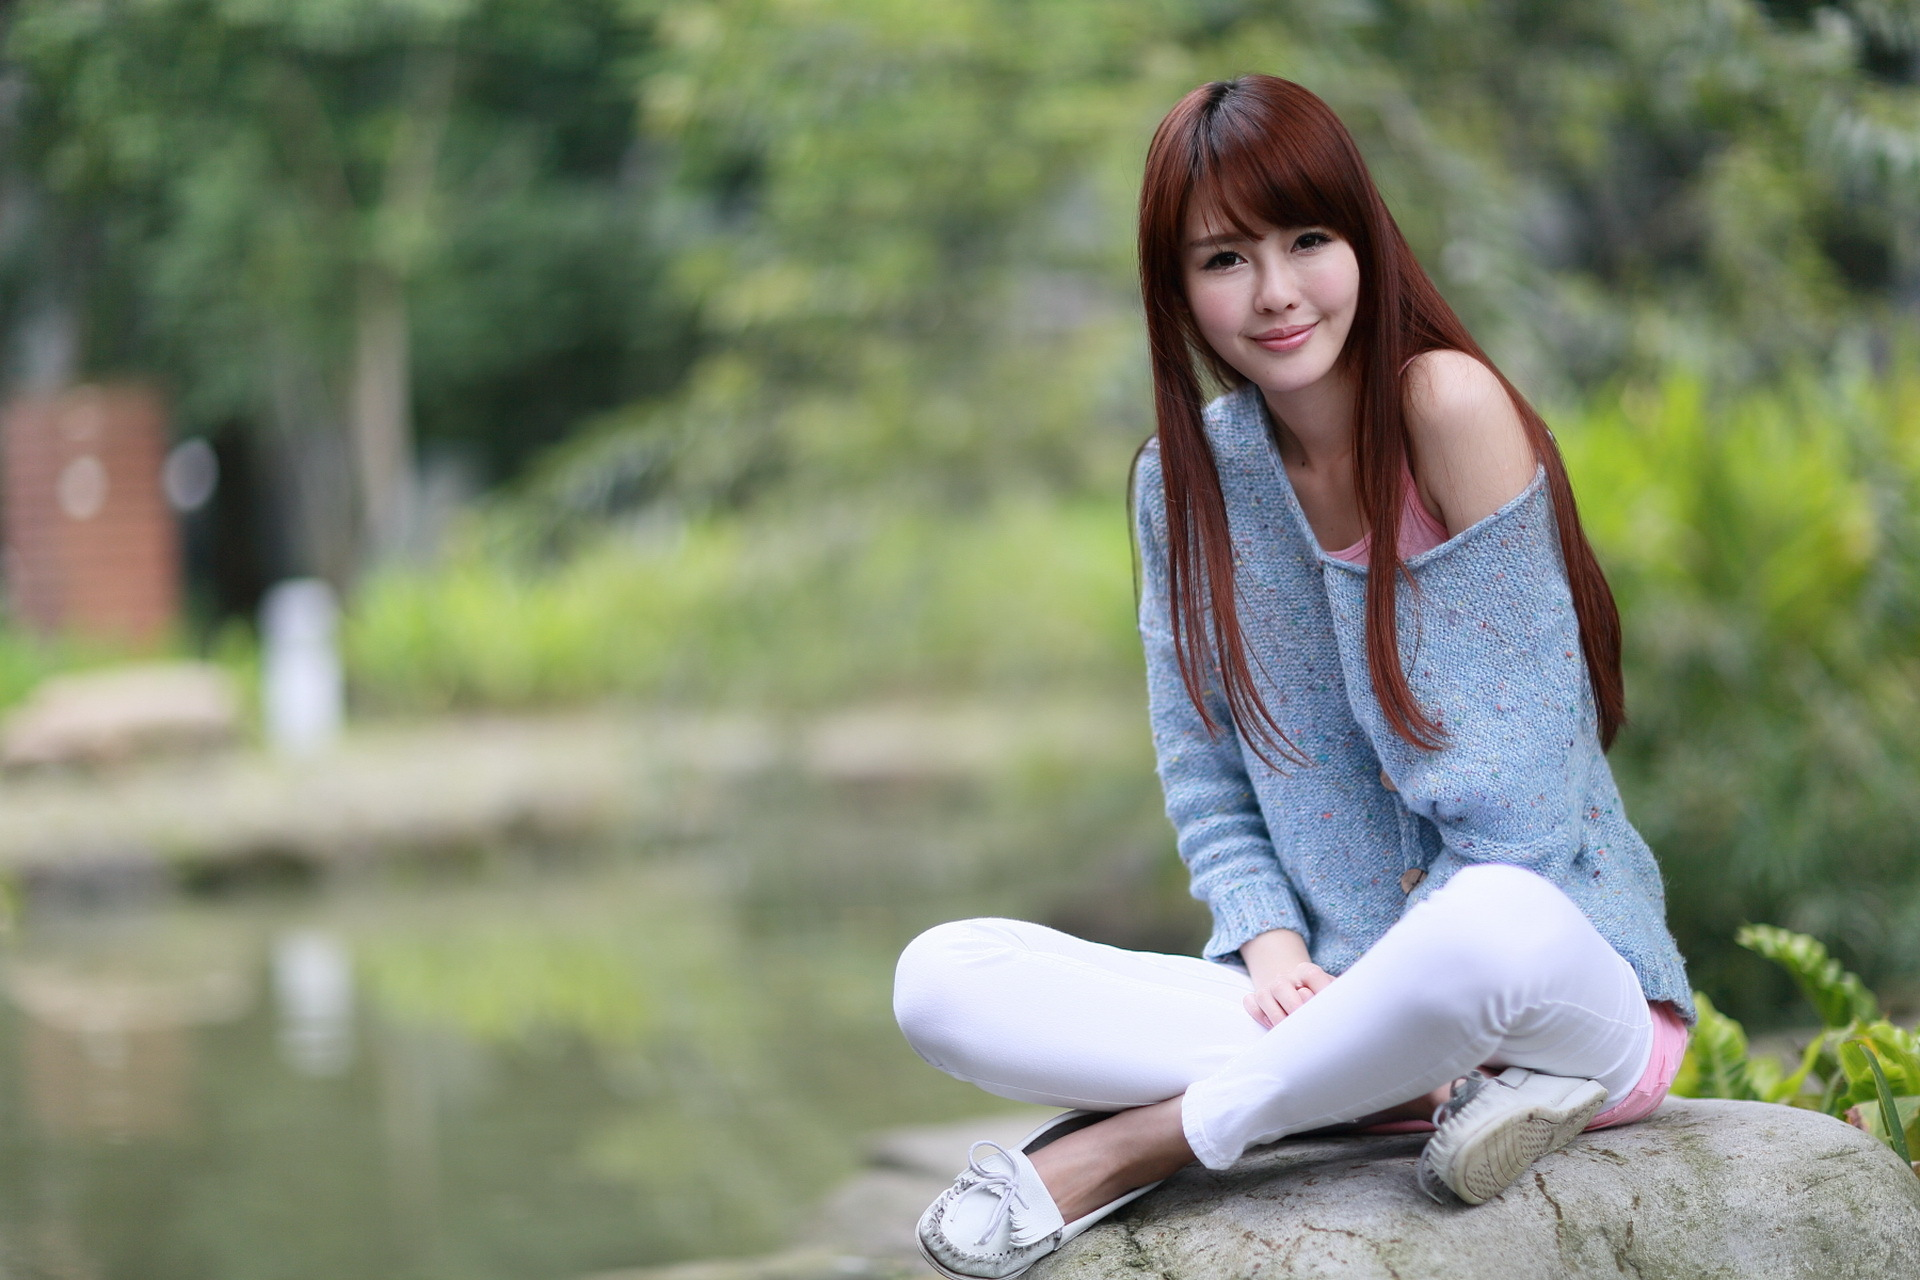 Outdoor girl asian femdom drunk